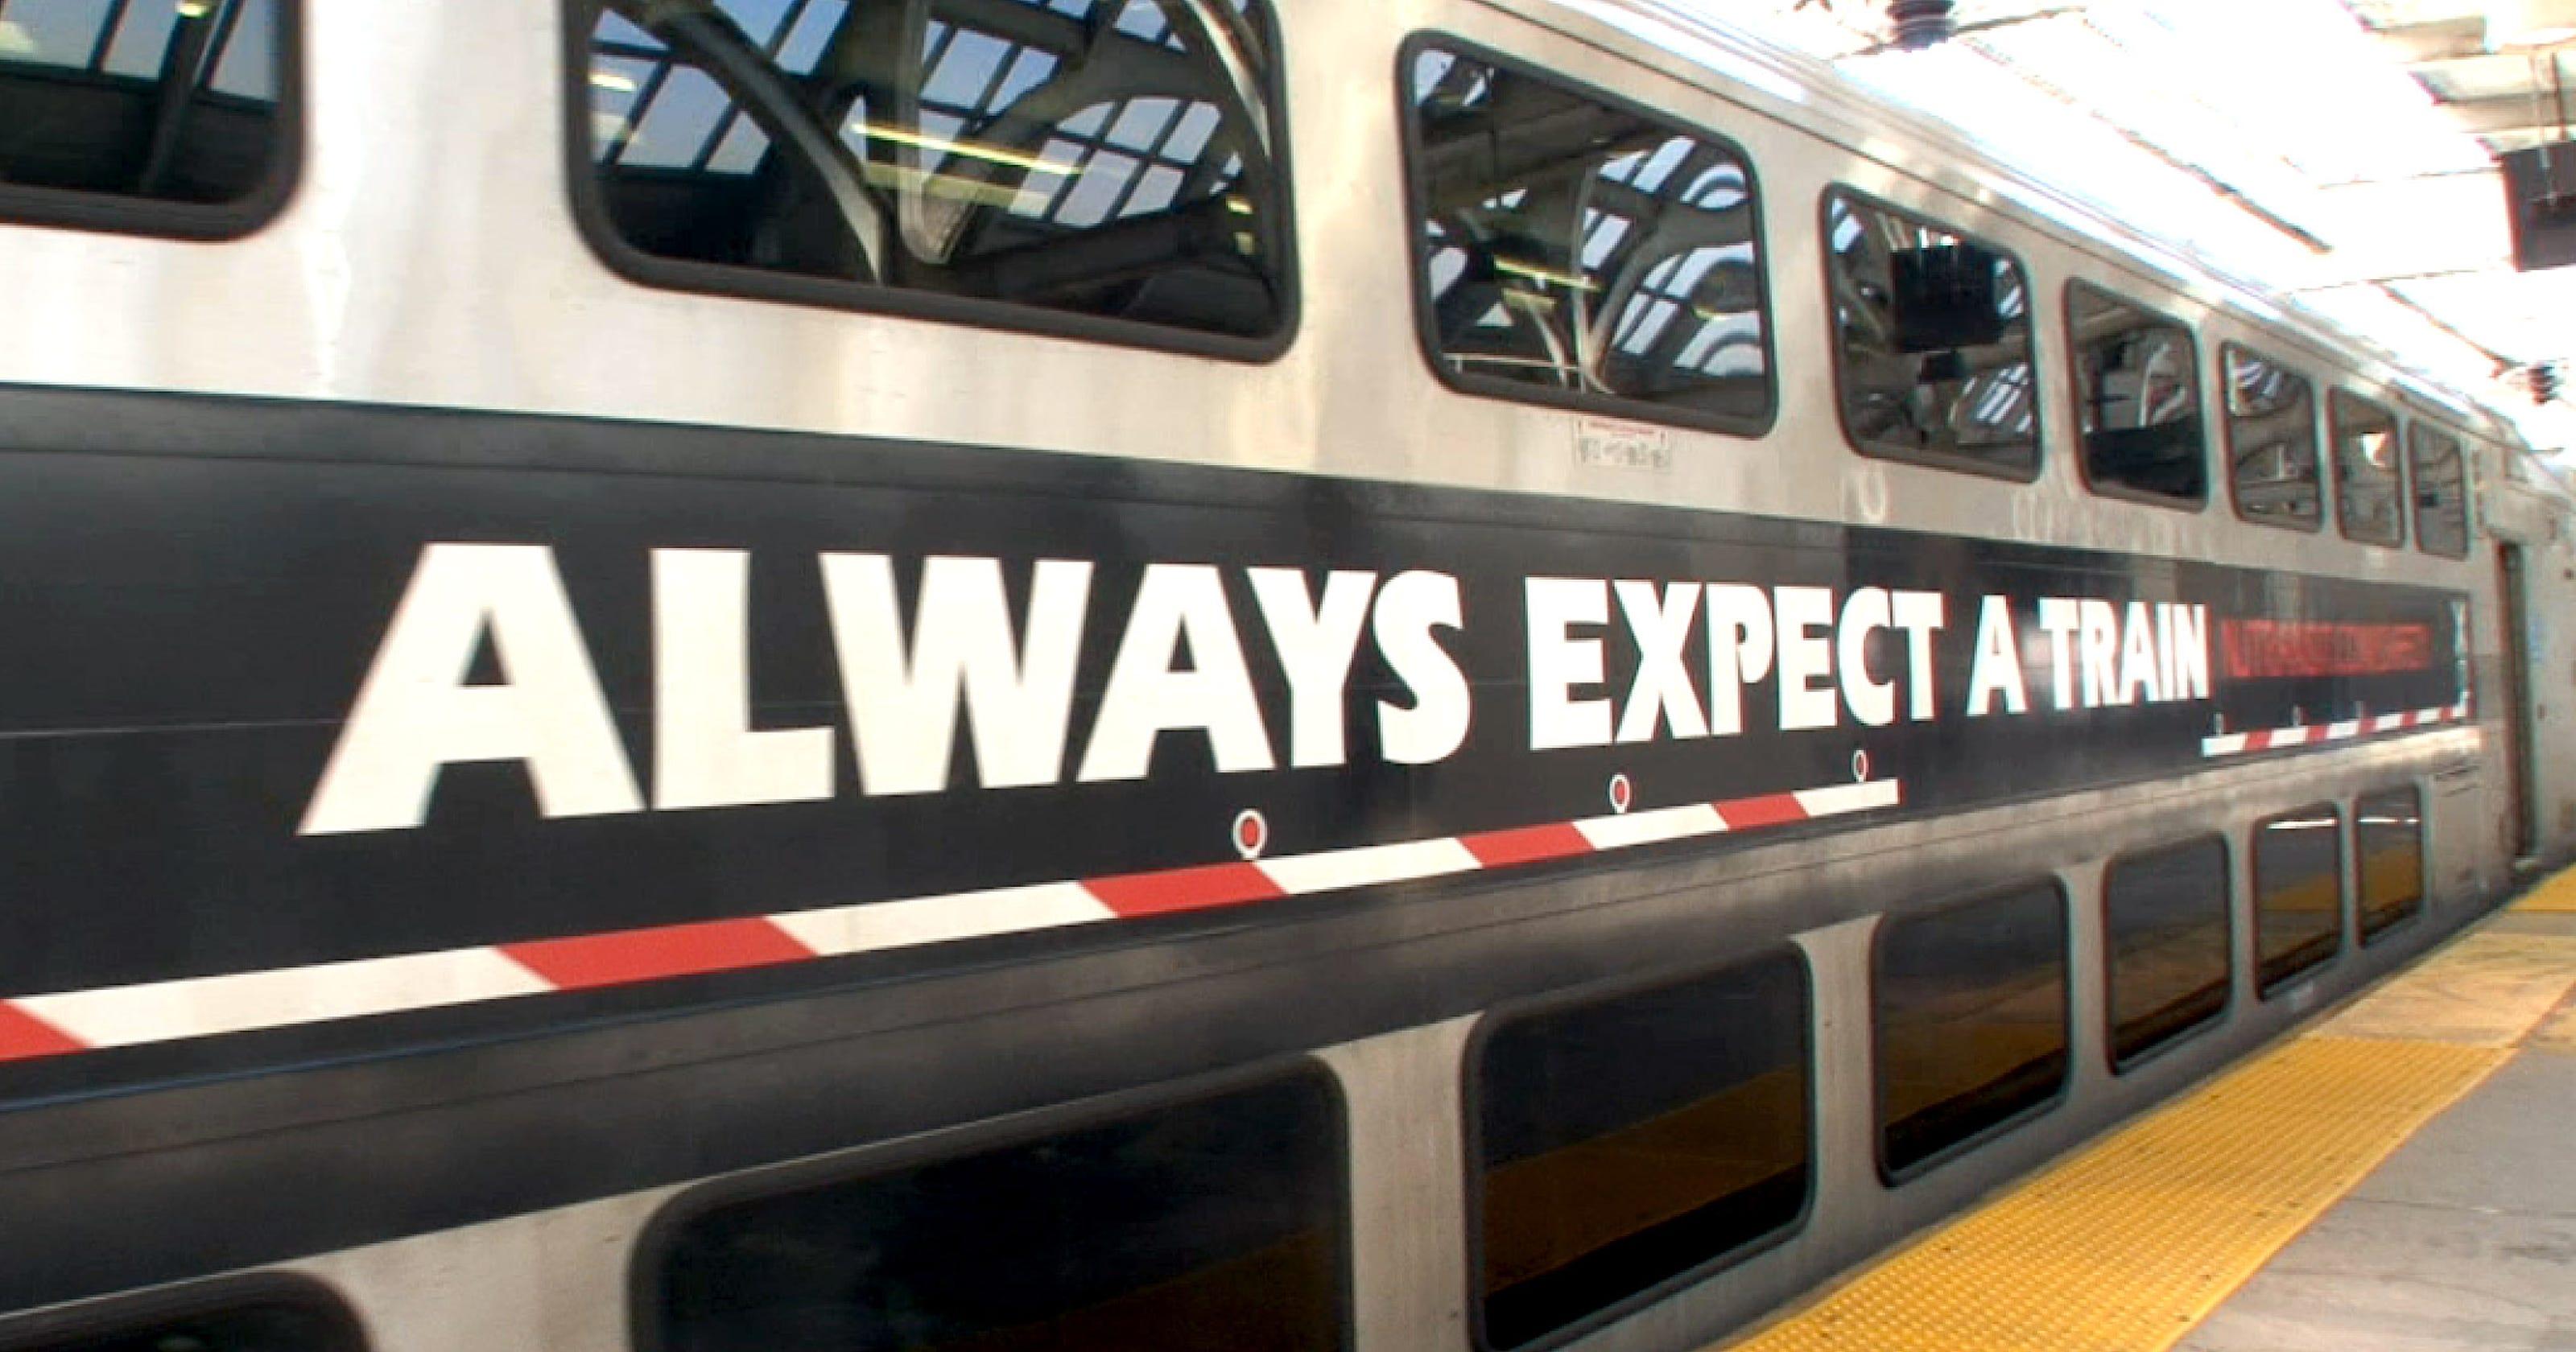 NJ Transit strike: Target on conductors' backs?